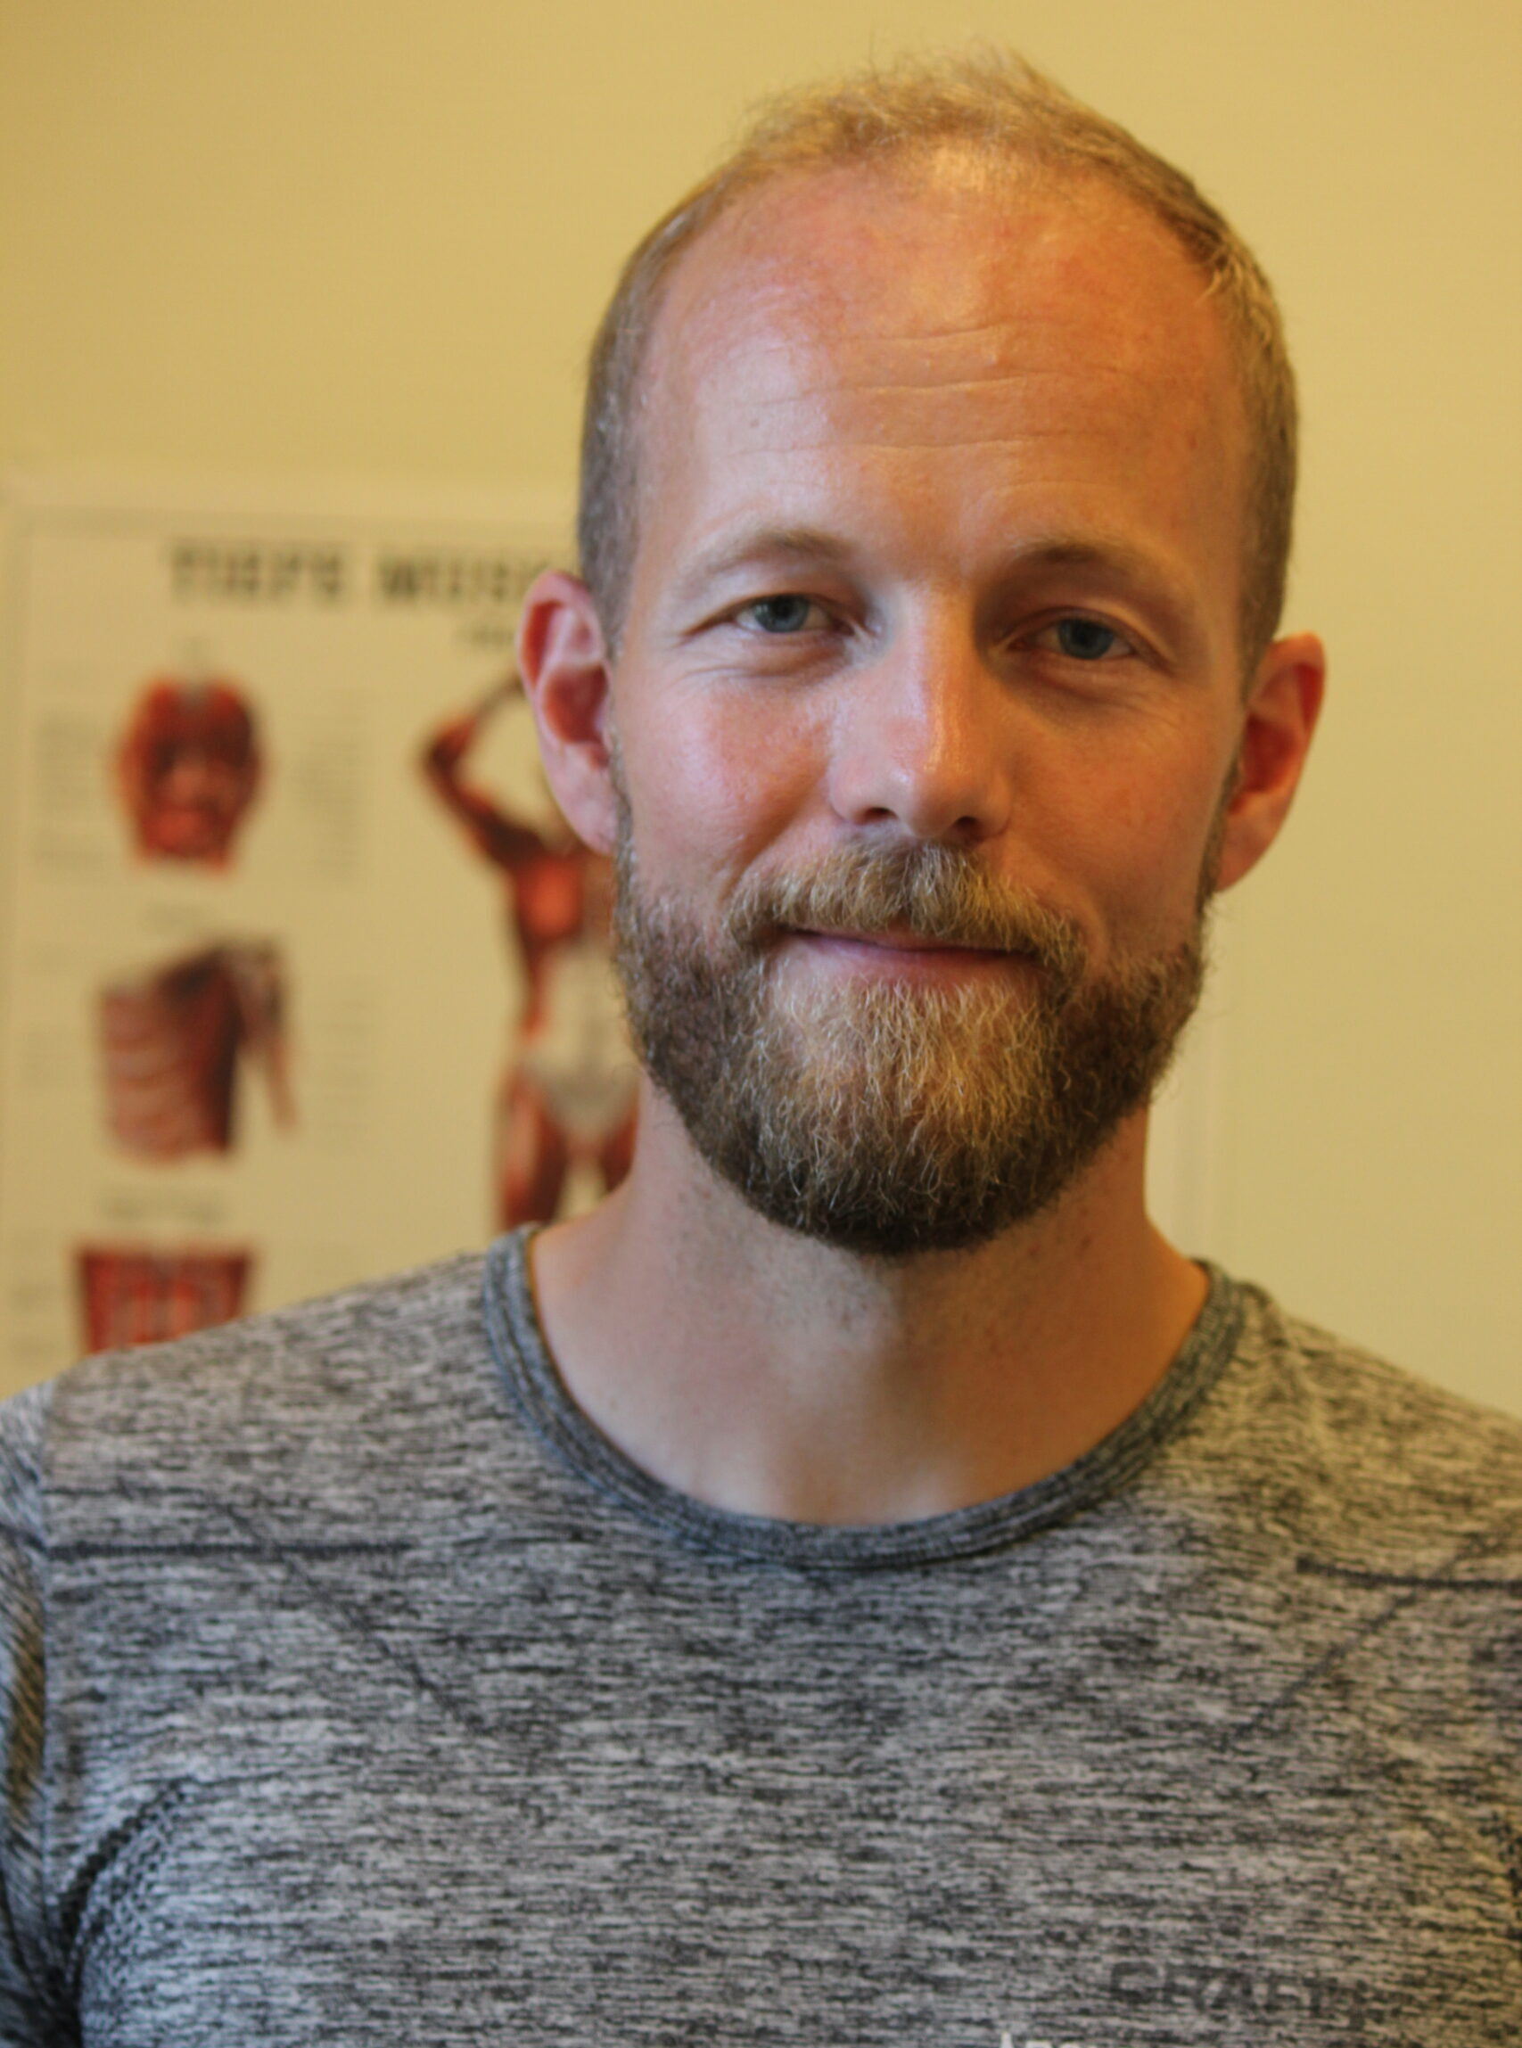 Fysioterapeut Jeppe Hvergel